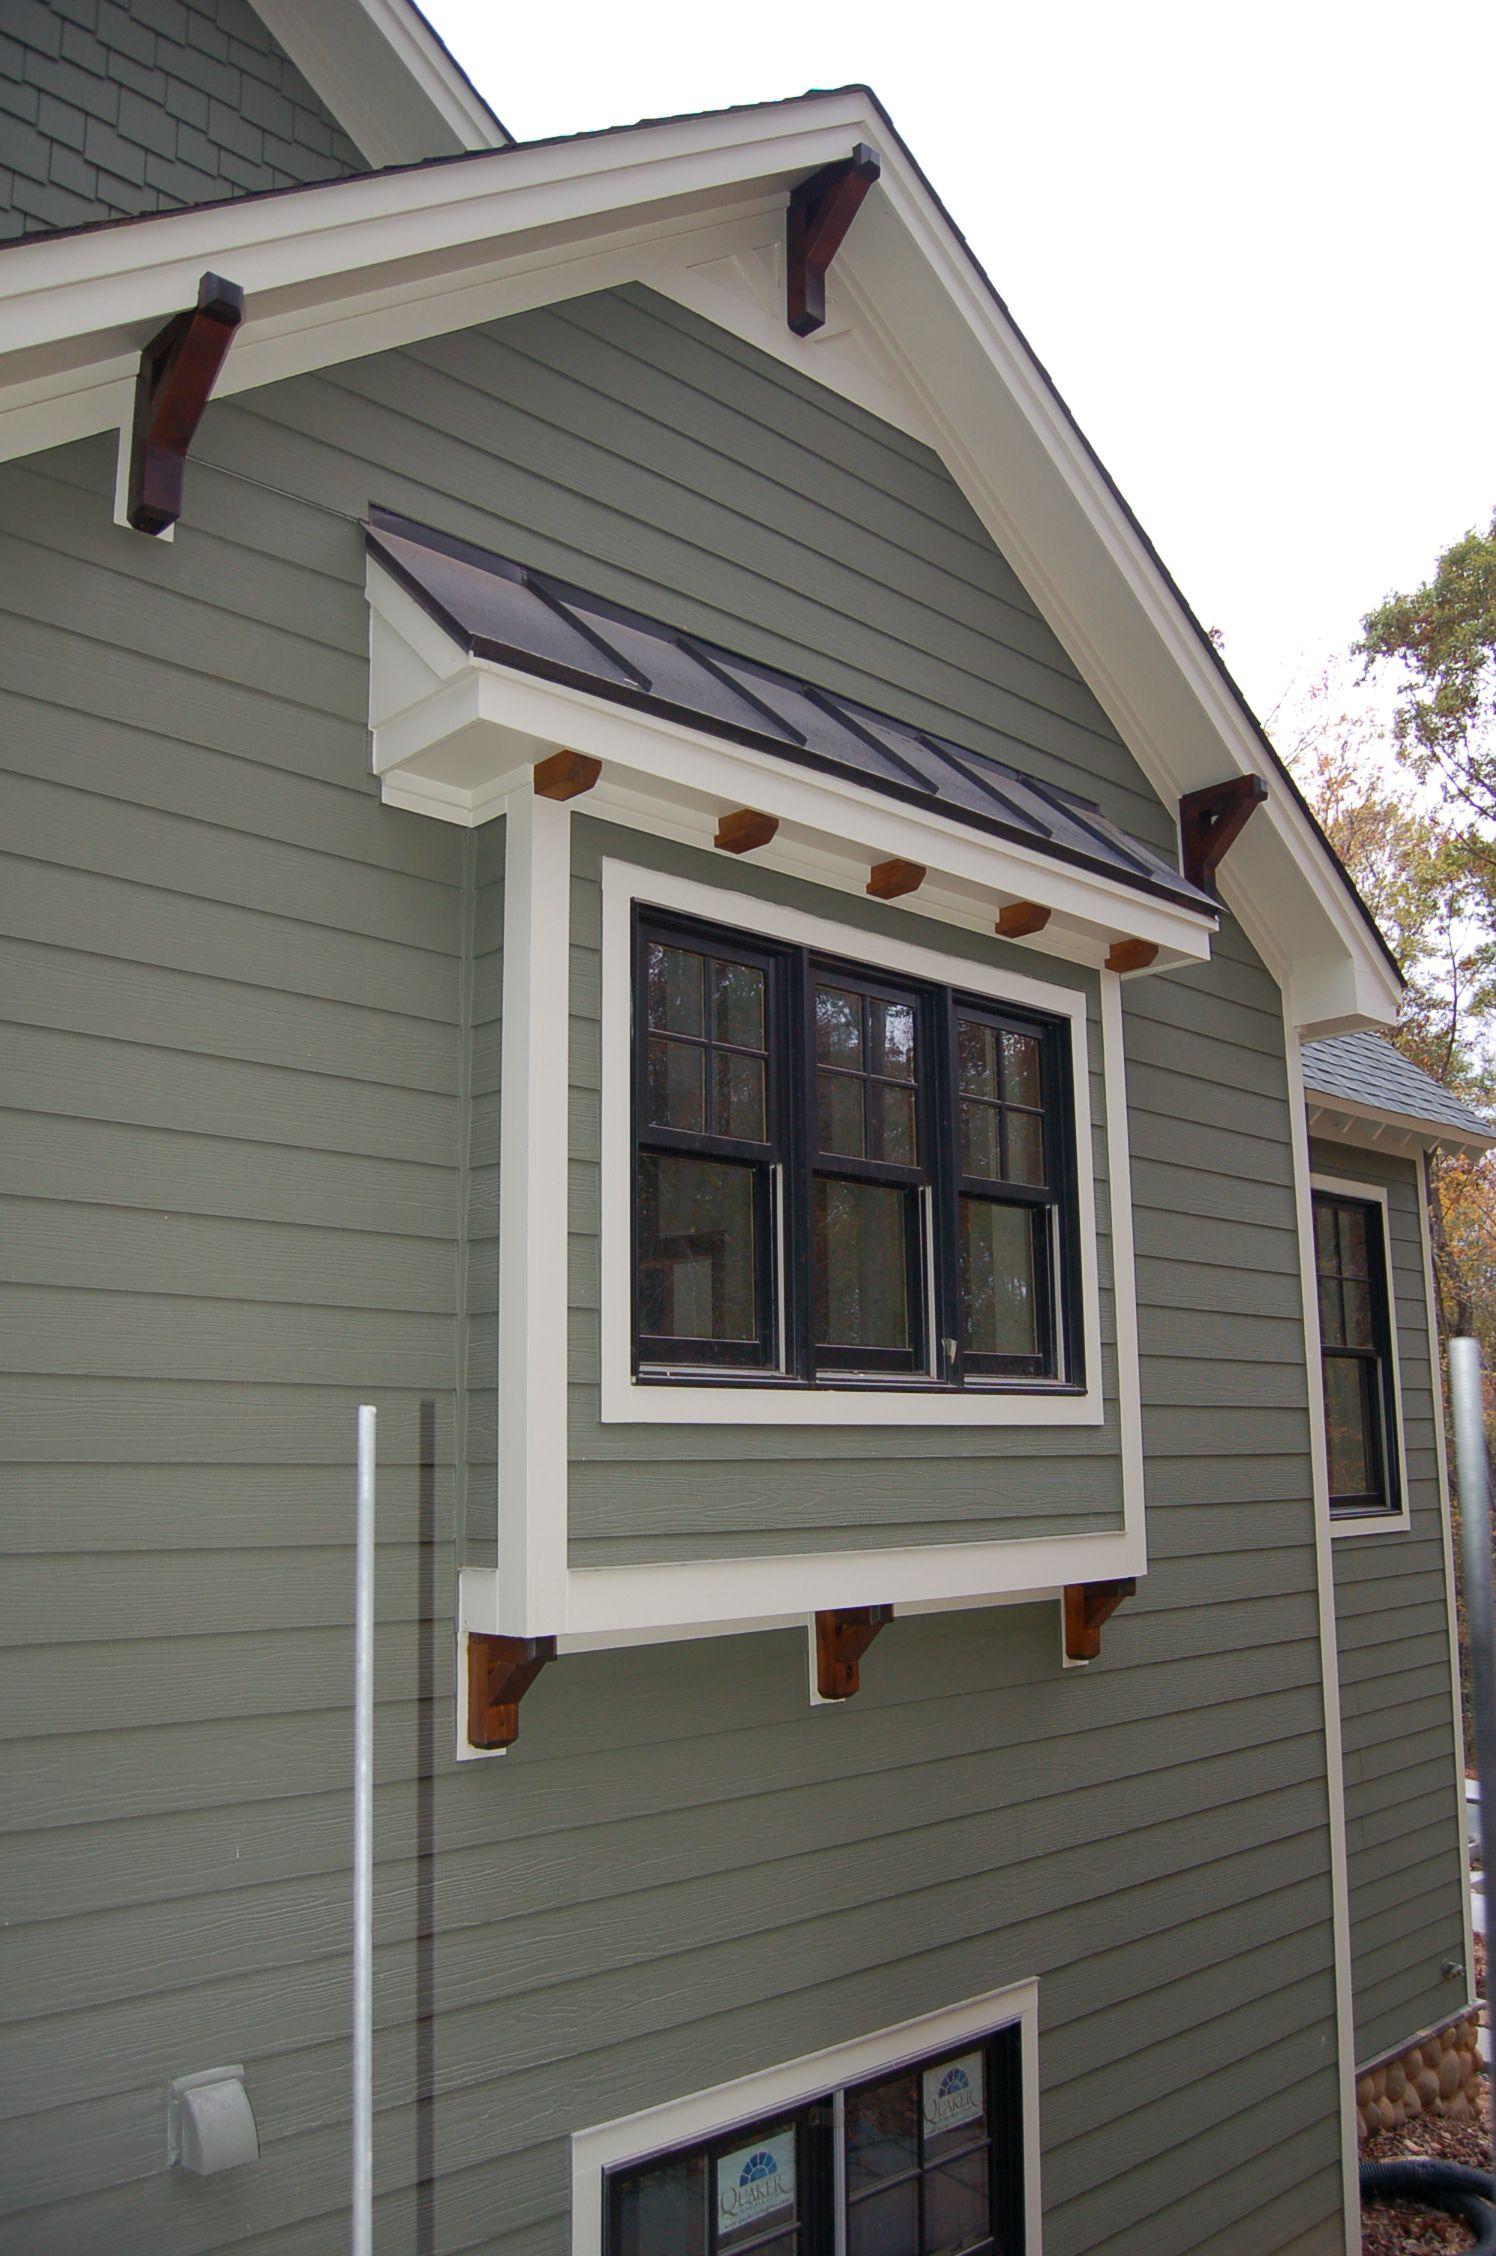 Completely New Aweinspiring Doors 3 Blind Mice Exterior Window Treatments Ideas Br26 Craftsman Exterior Window Trim Exterior Craftsman House